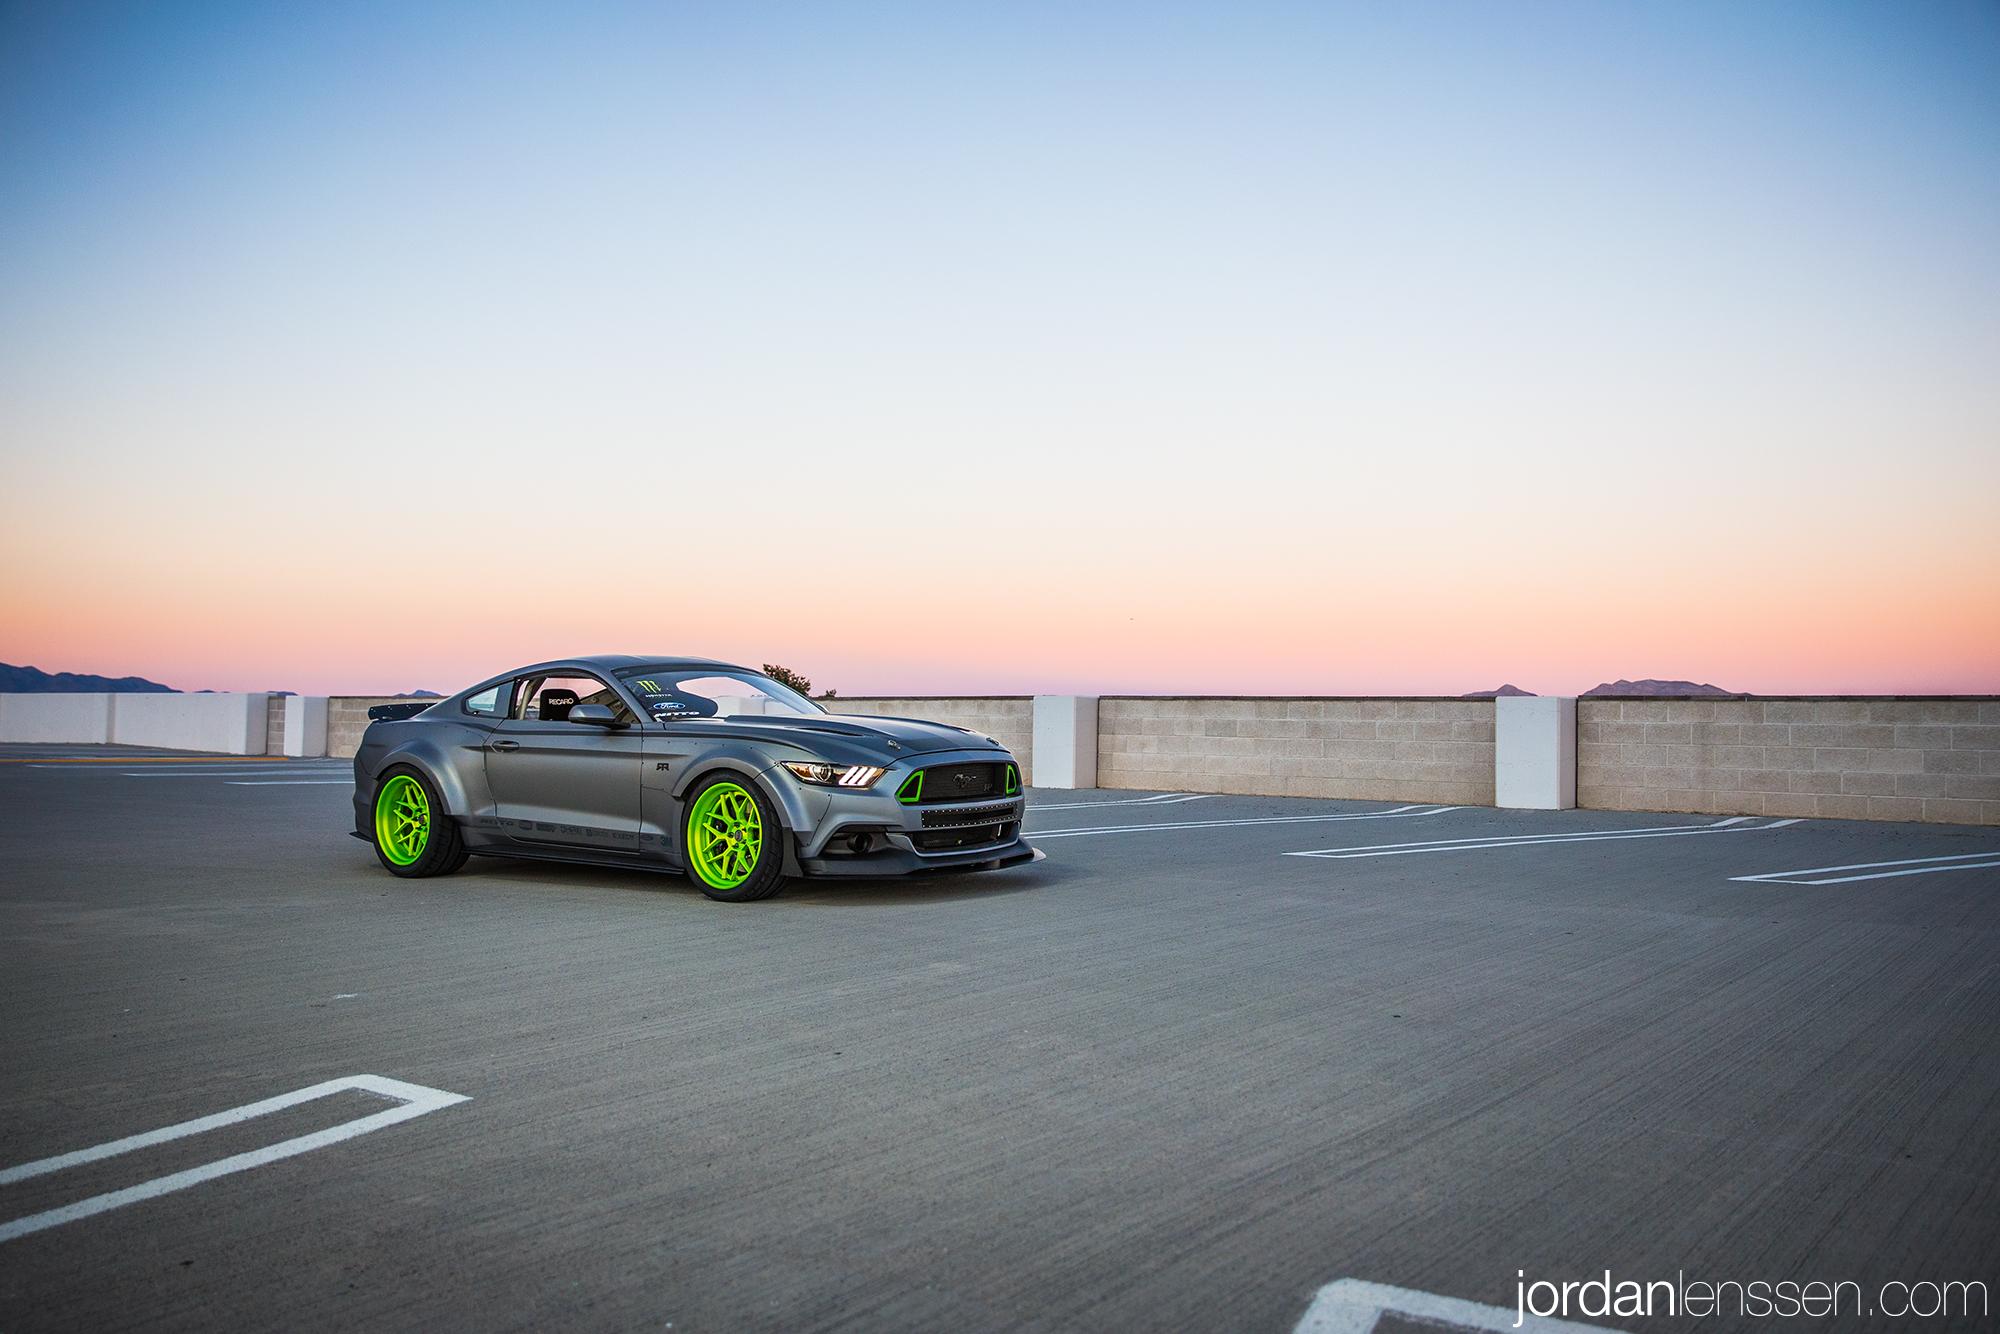 Vaughn_Gittin_Mustang_RTR_Spec_5_Concept_6.jpg